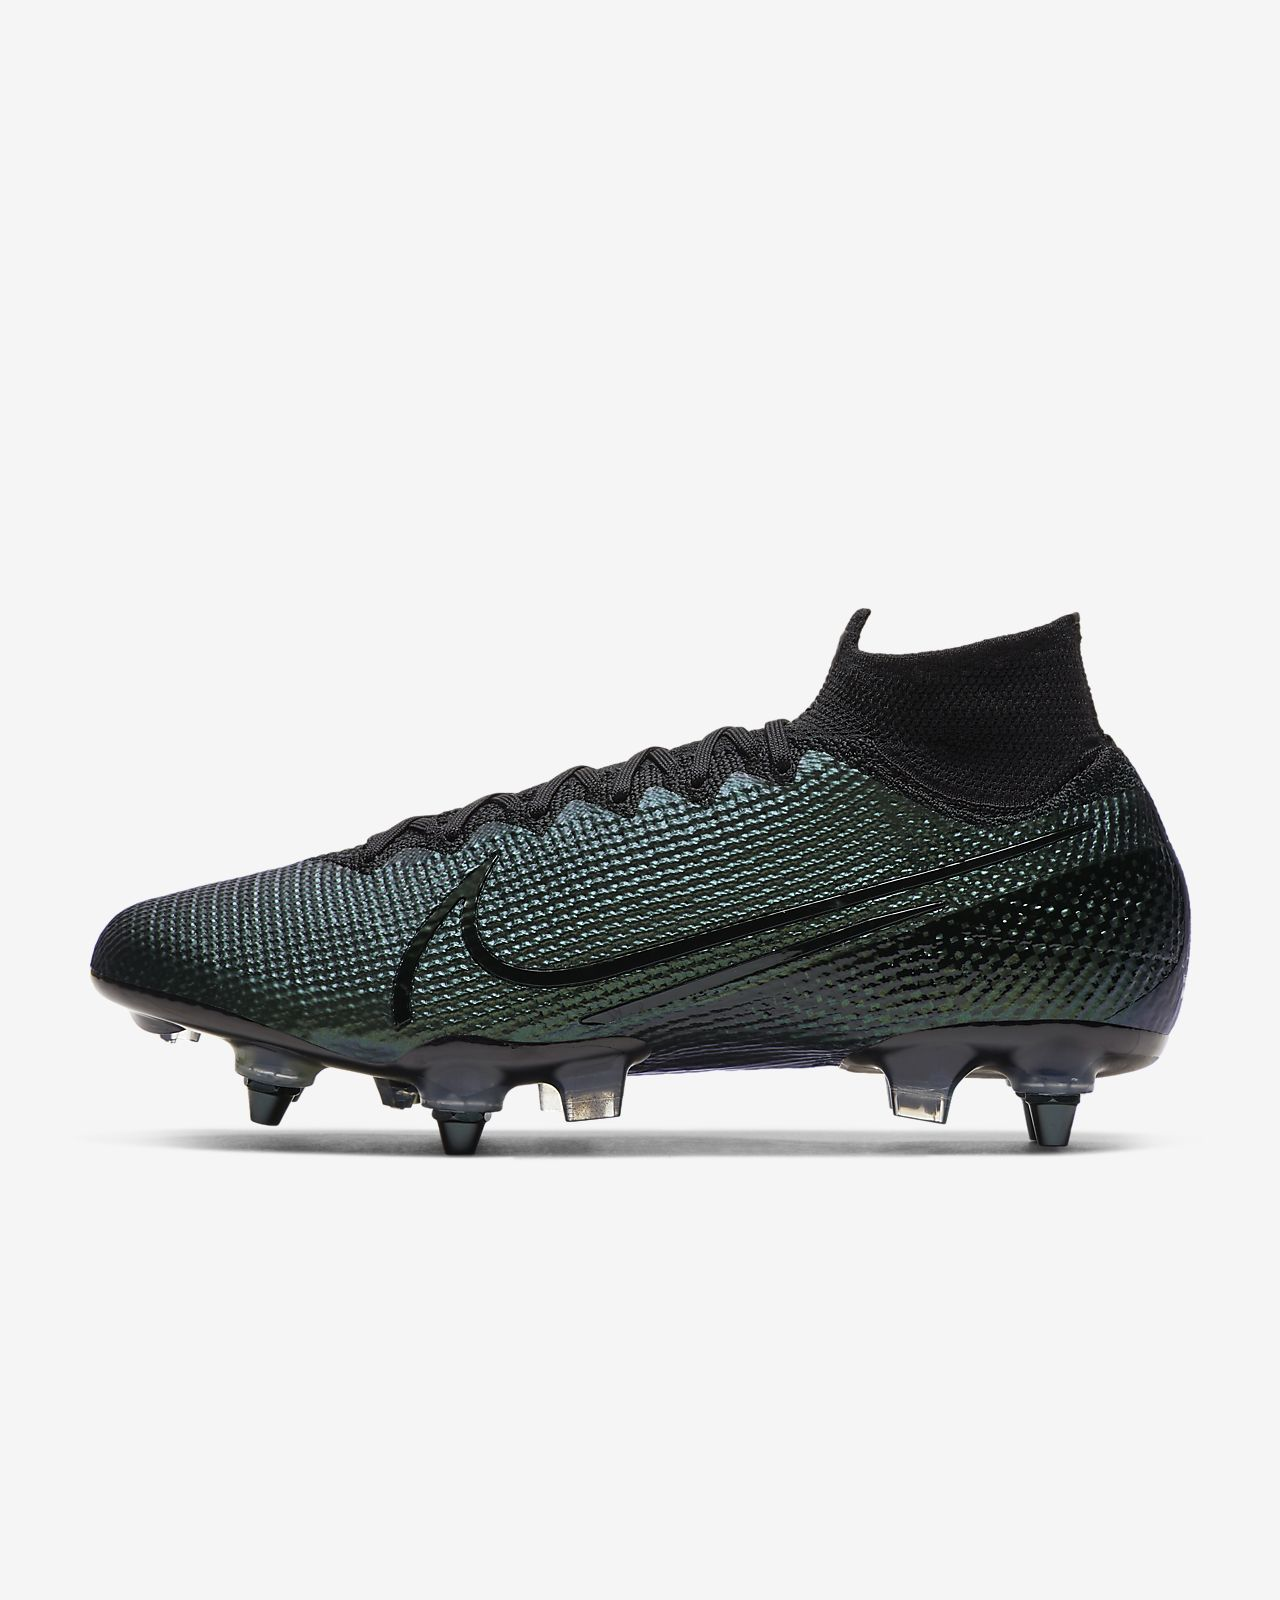 nike fotbollsskor superfly, Nike Air Max 90 Skor VT Svart